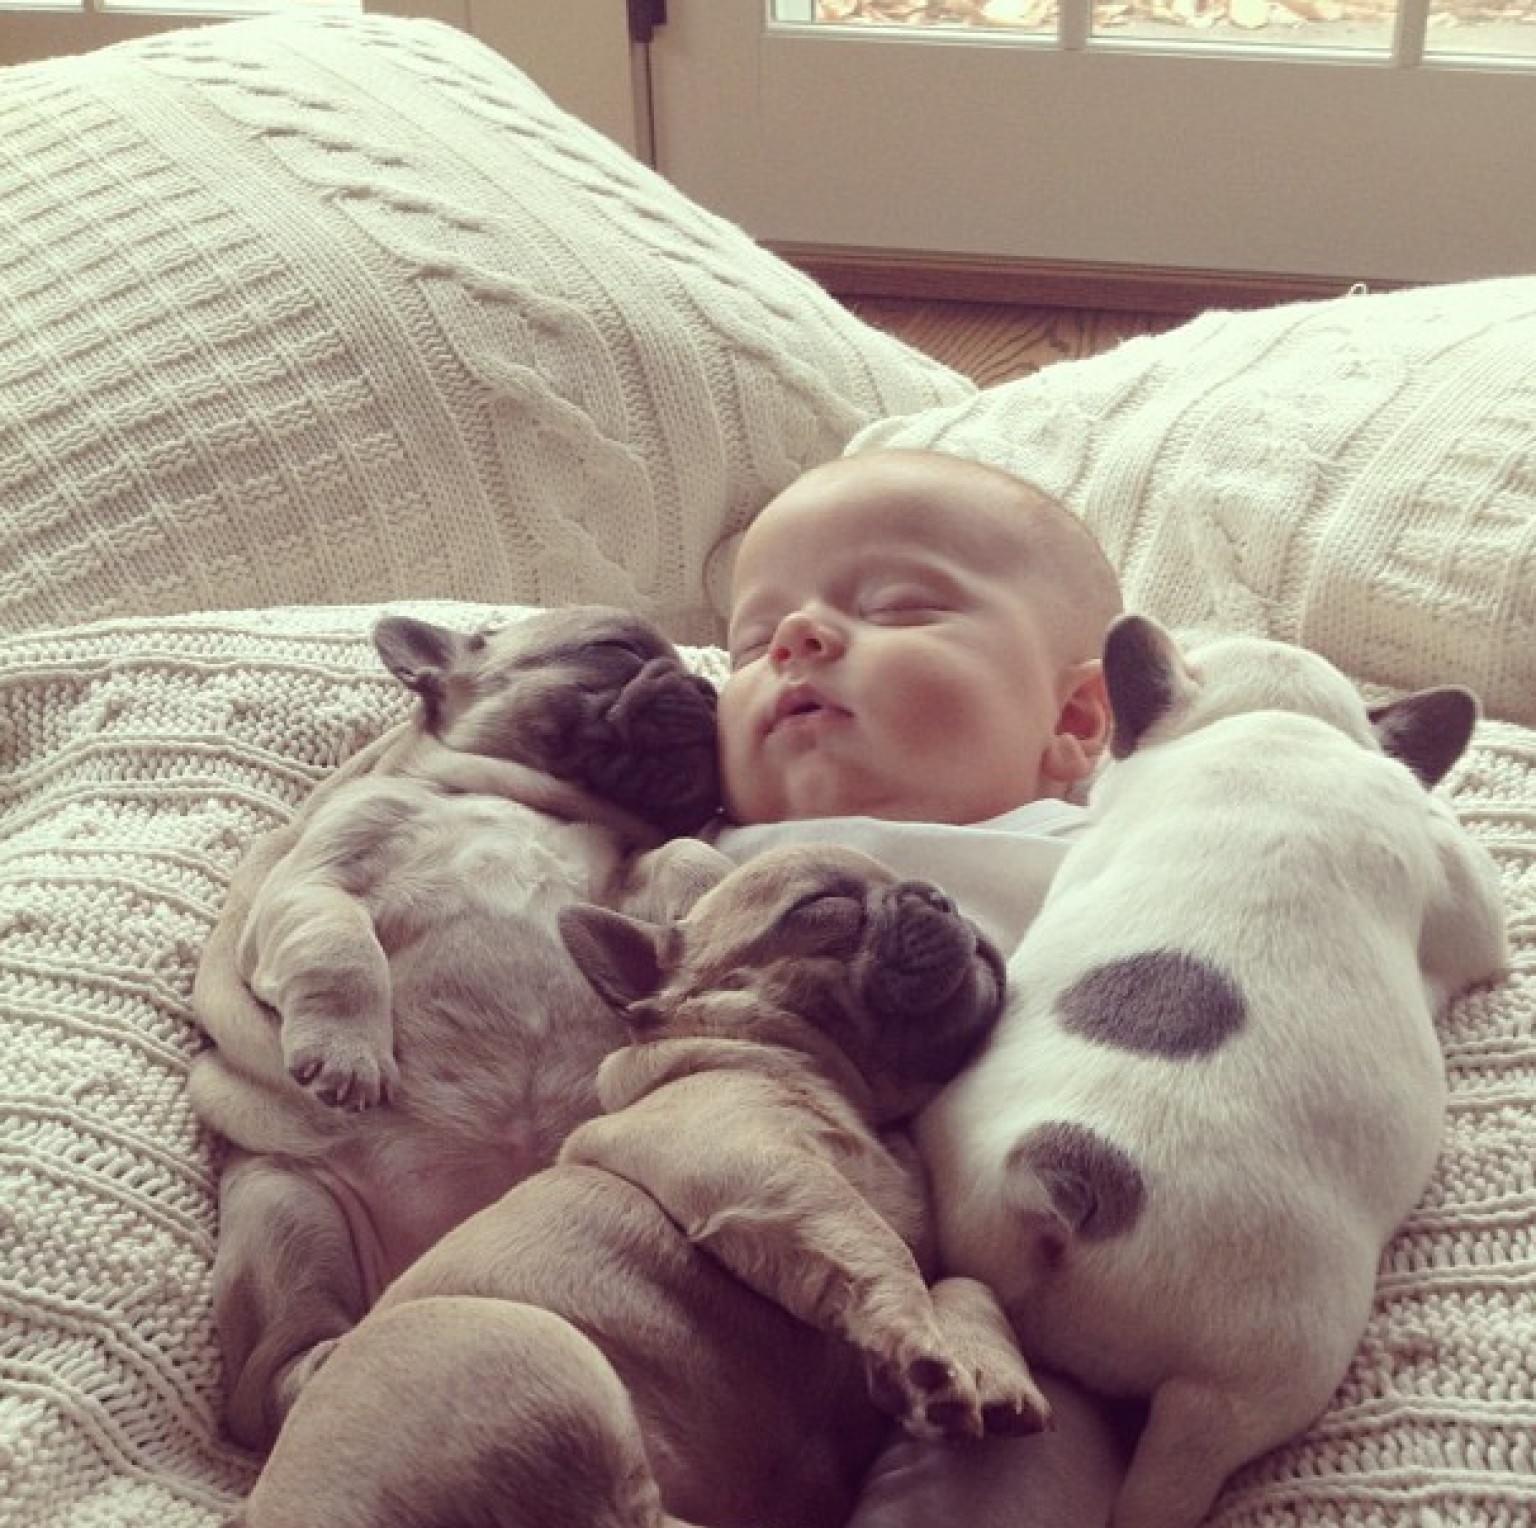 Baby Sleeping with French Bulldog (10)